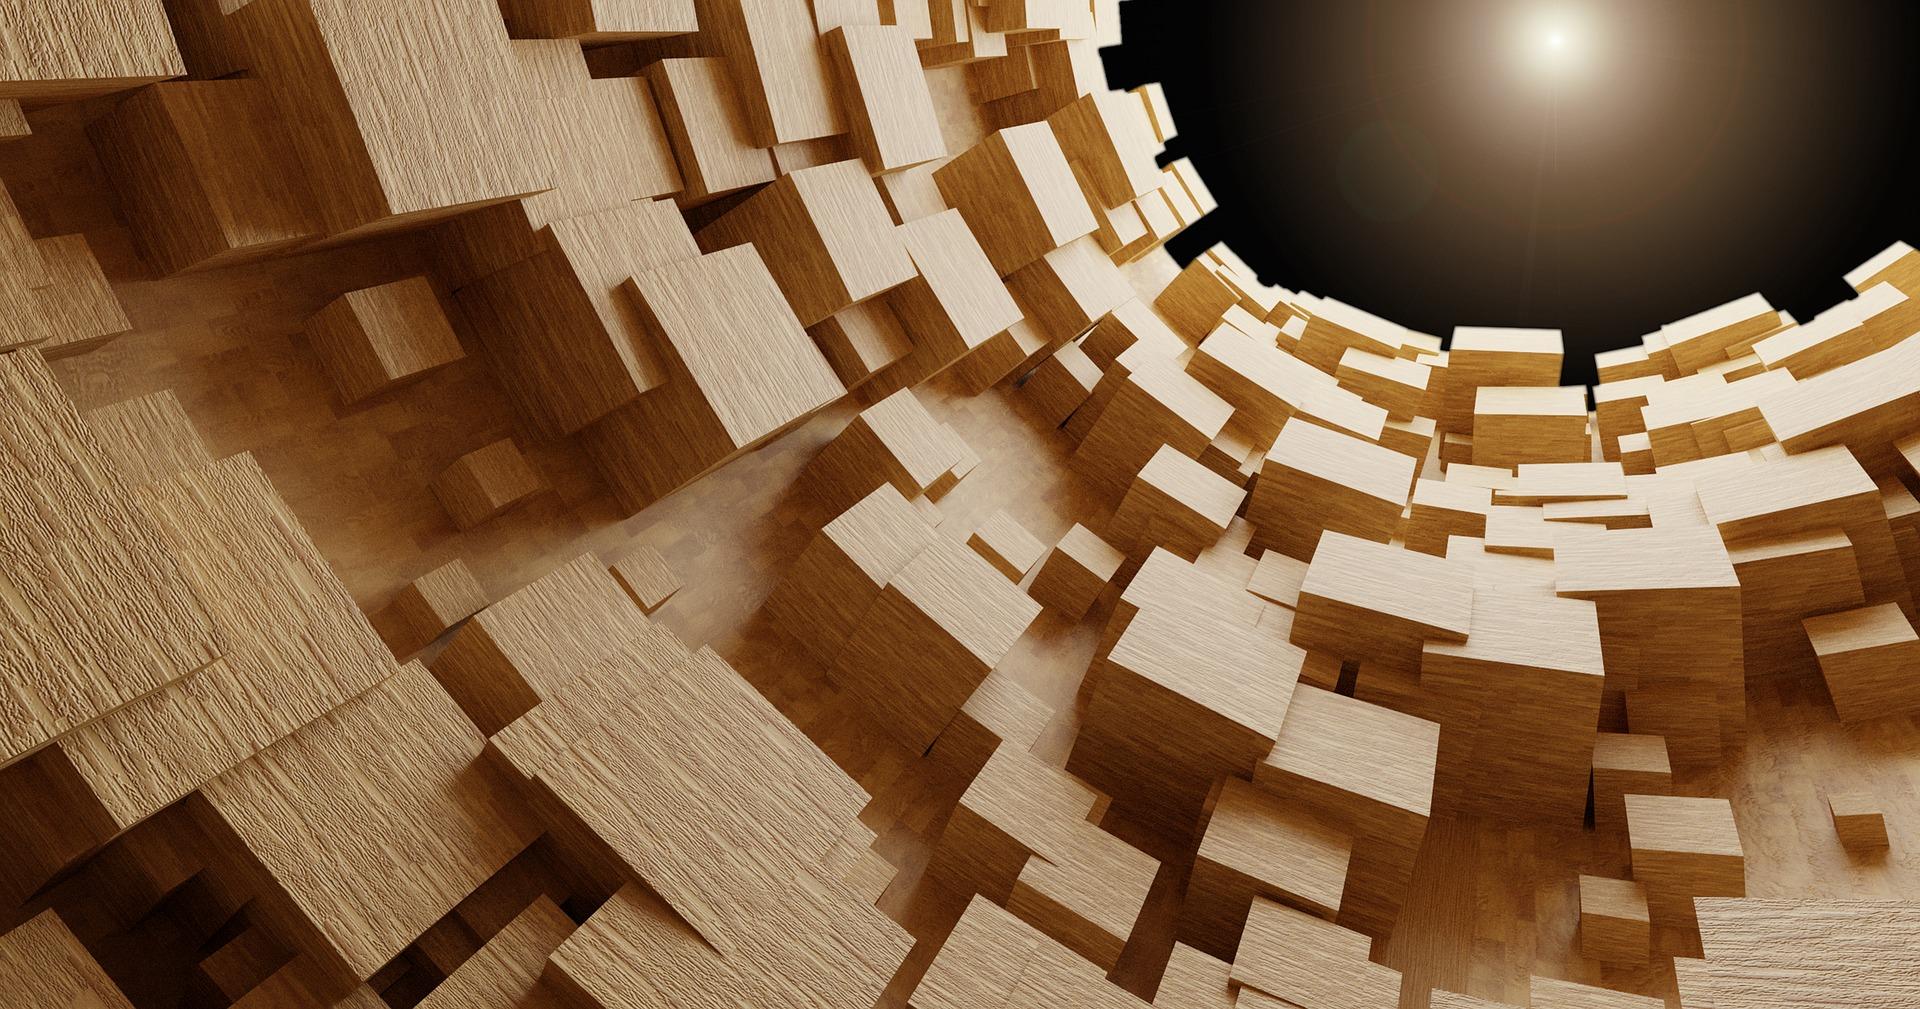 cube-2803223_1920.jpg